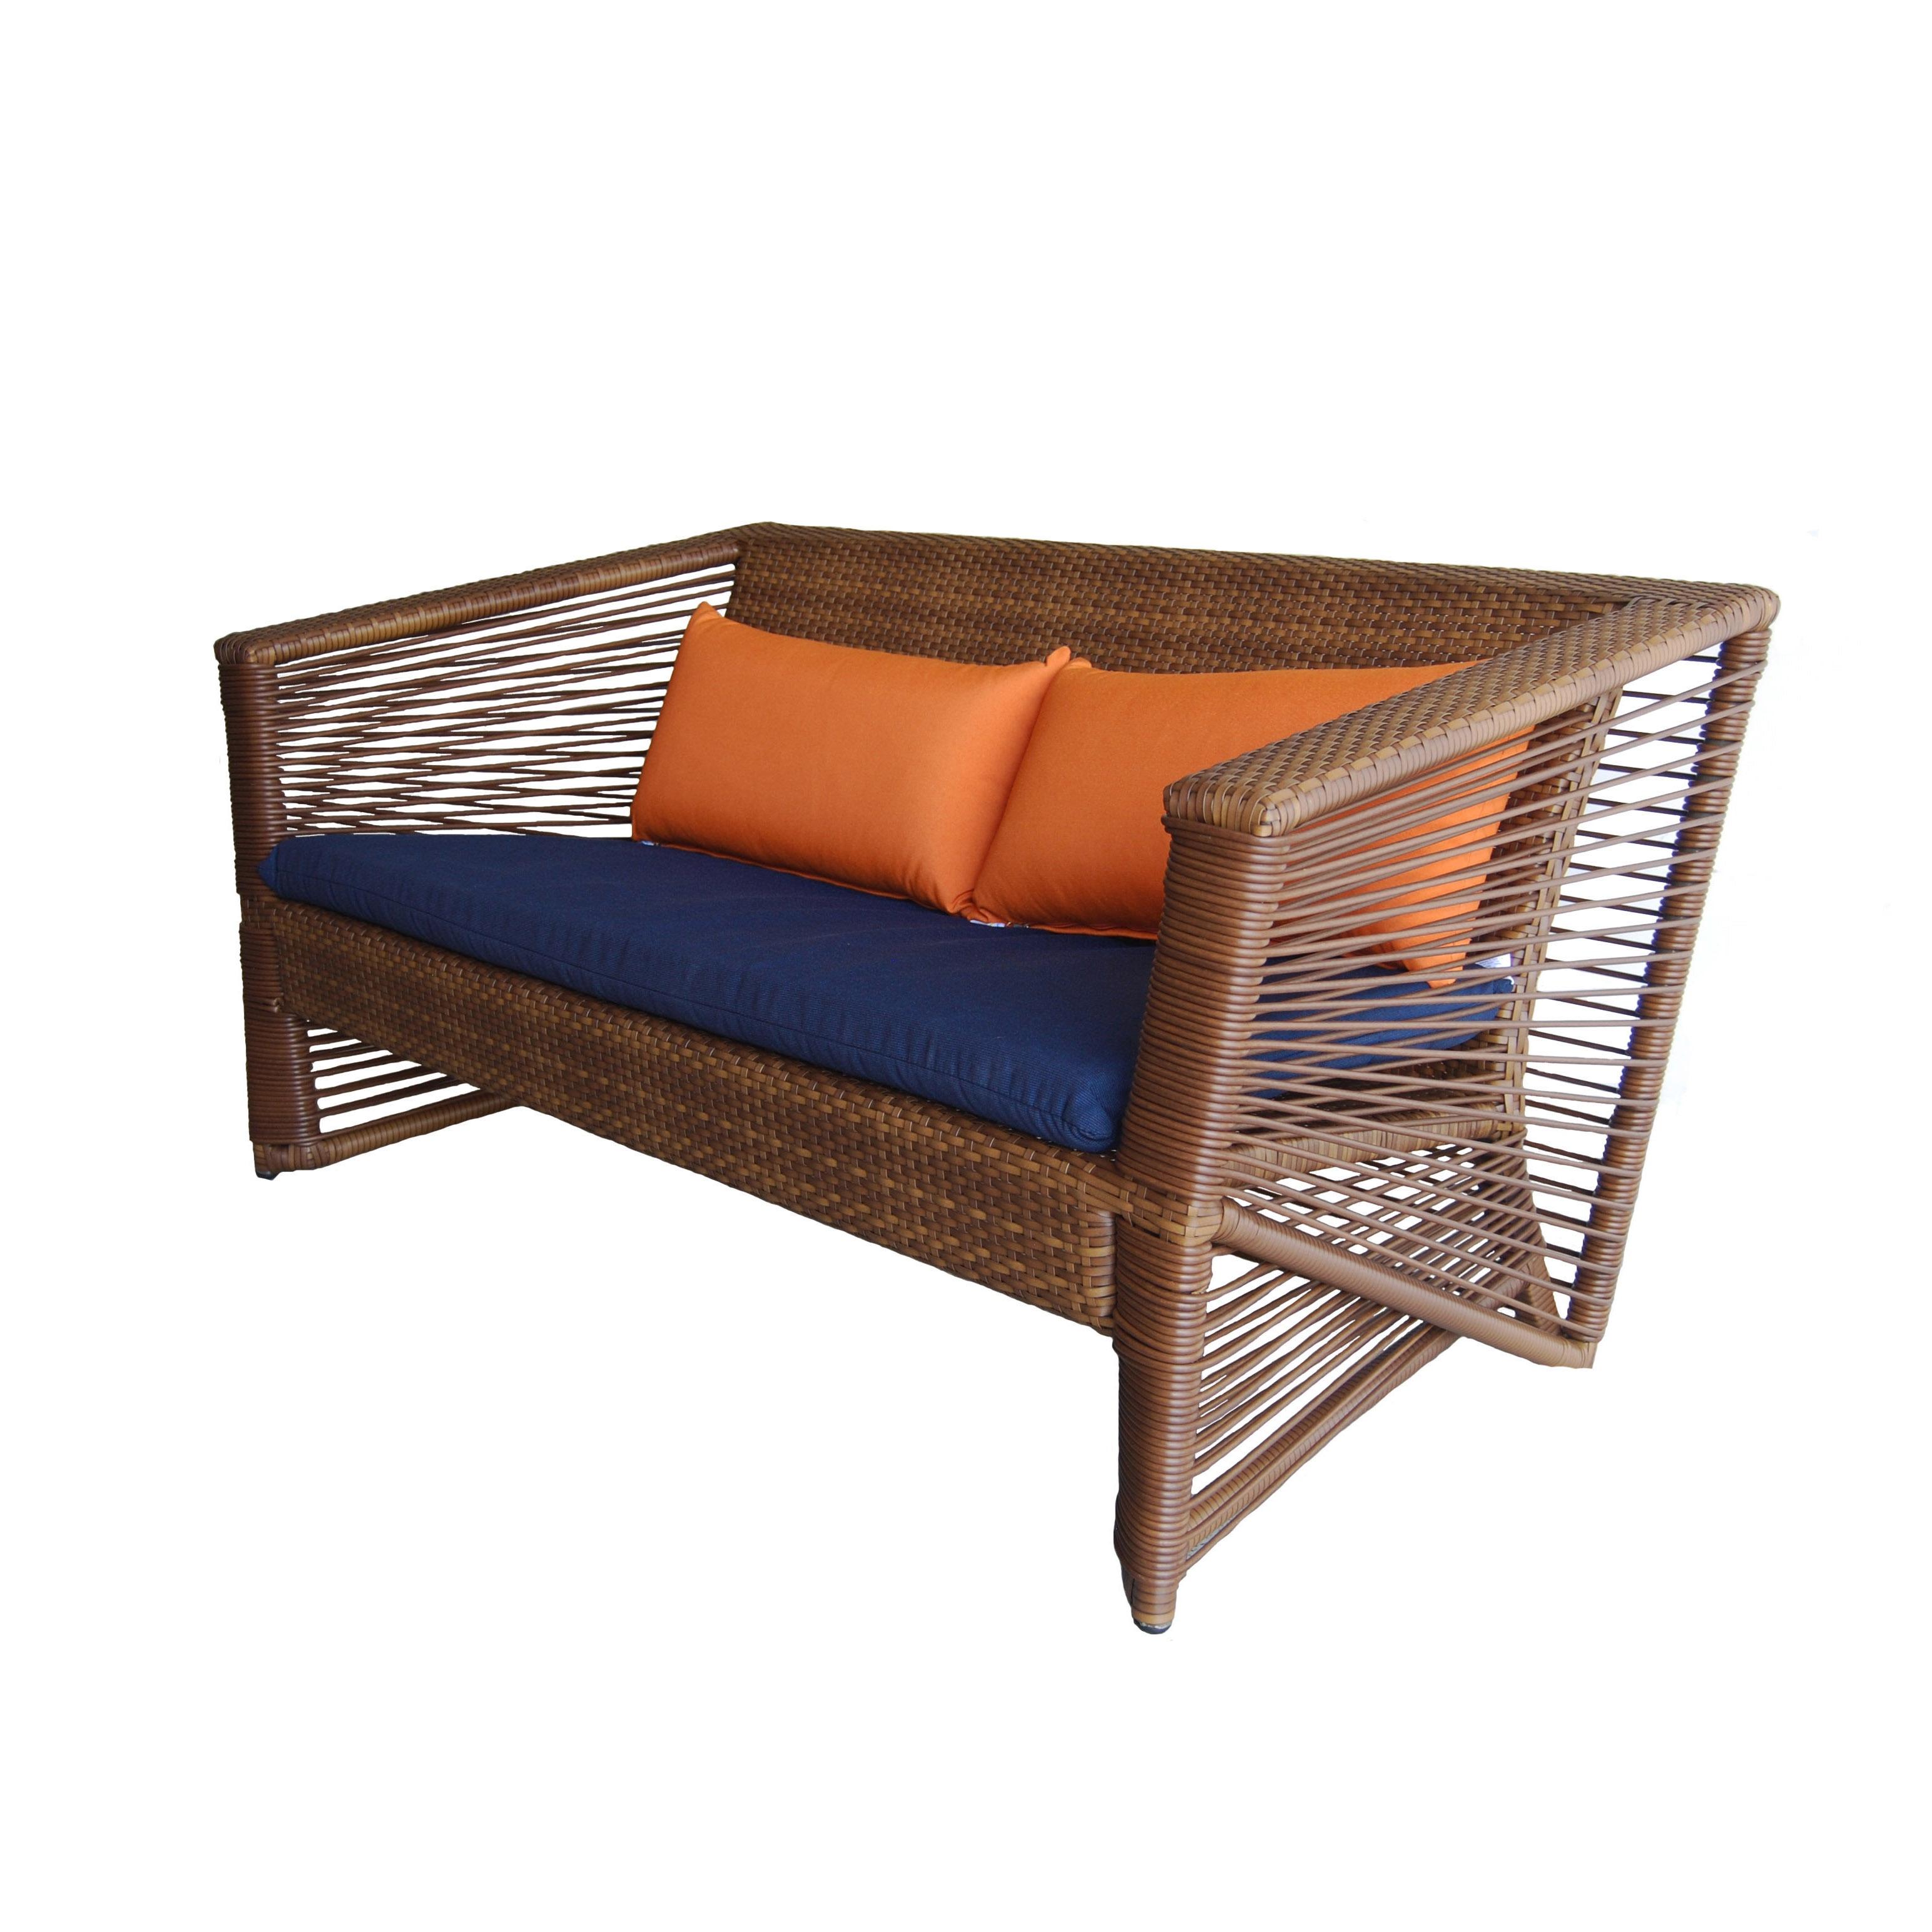 Incredible Borneo Outdoor Resin Wicker Sofa Bralicious Painted Fabric Chair Ideas Braliciousco